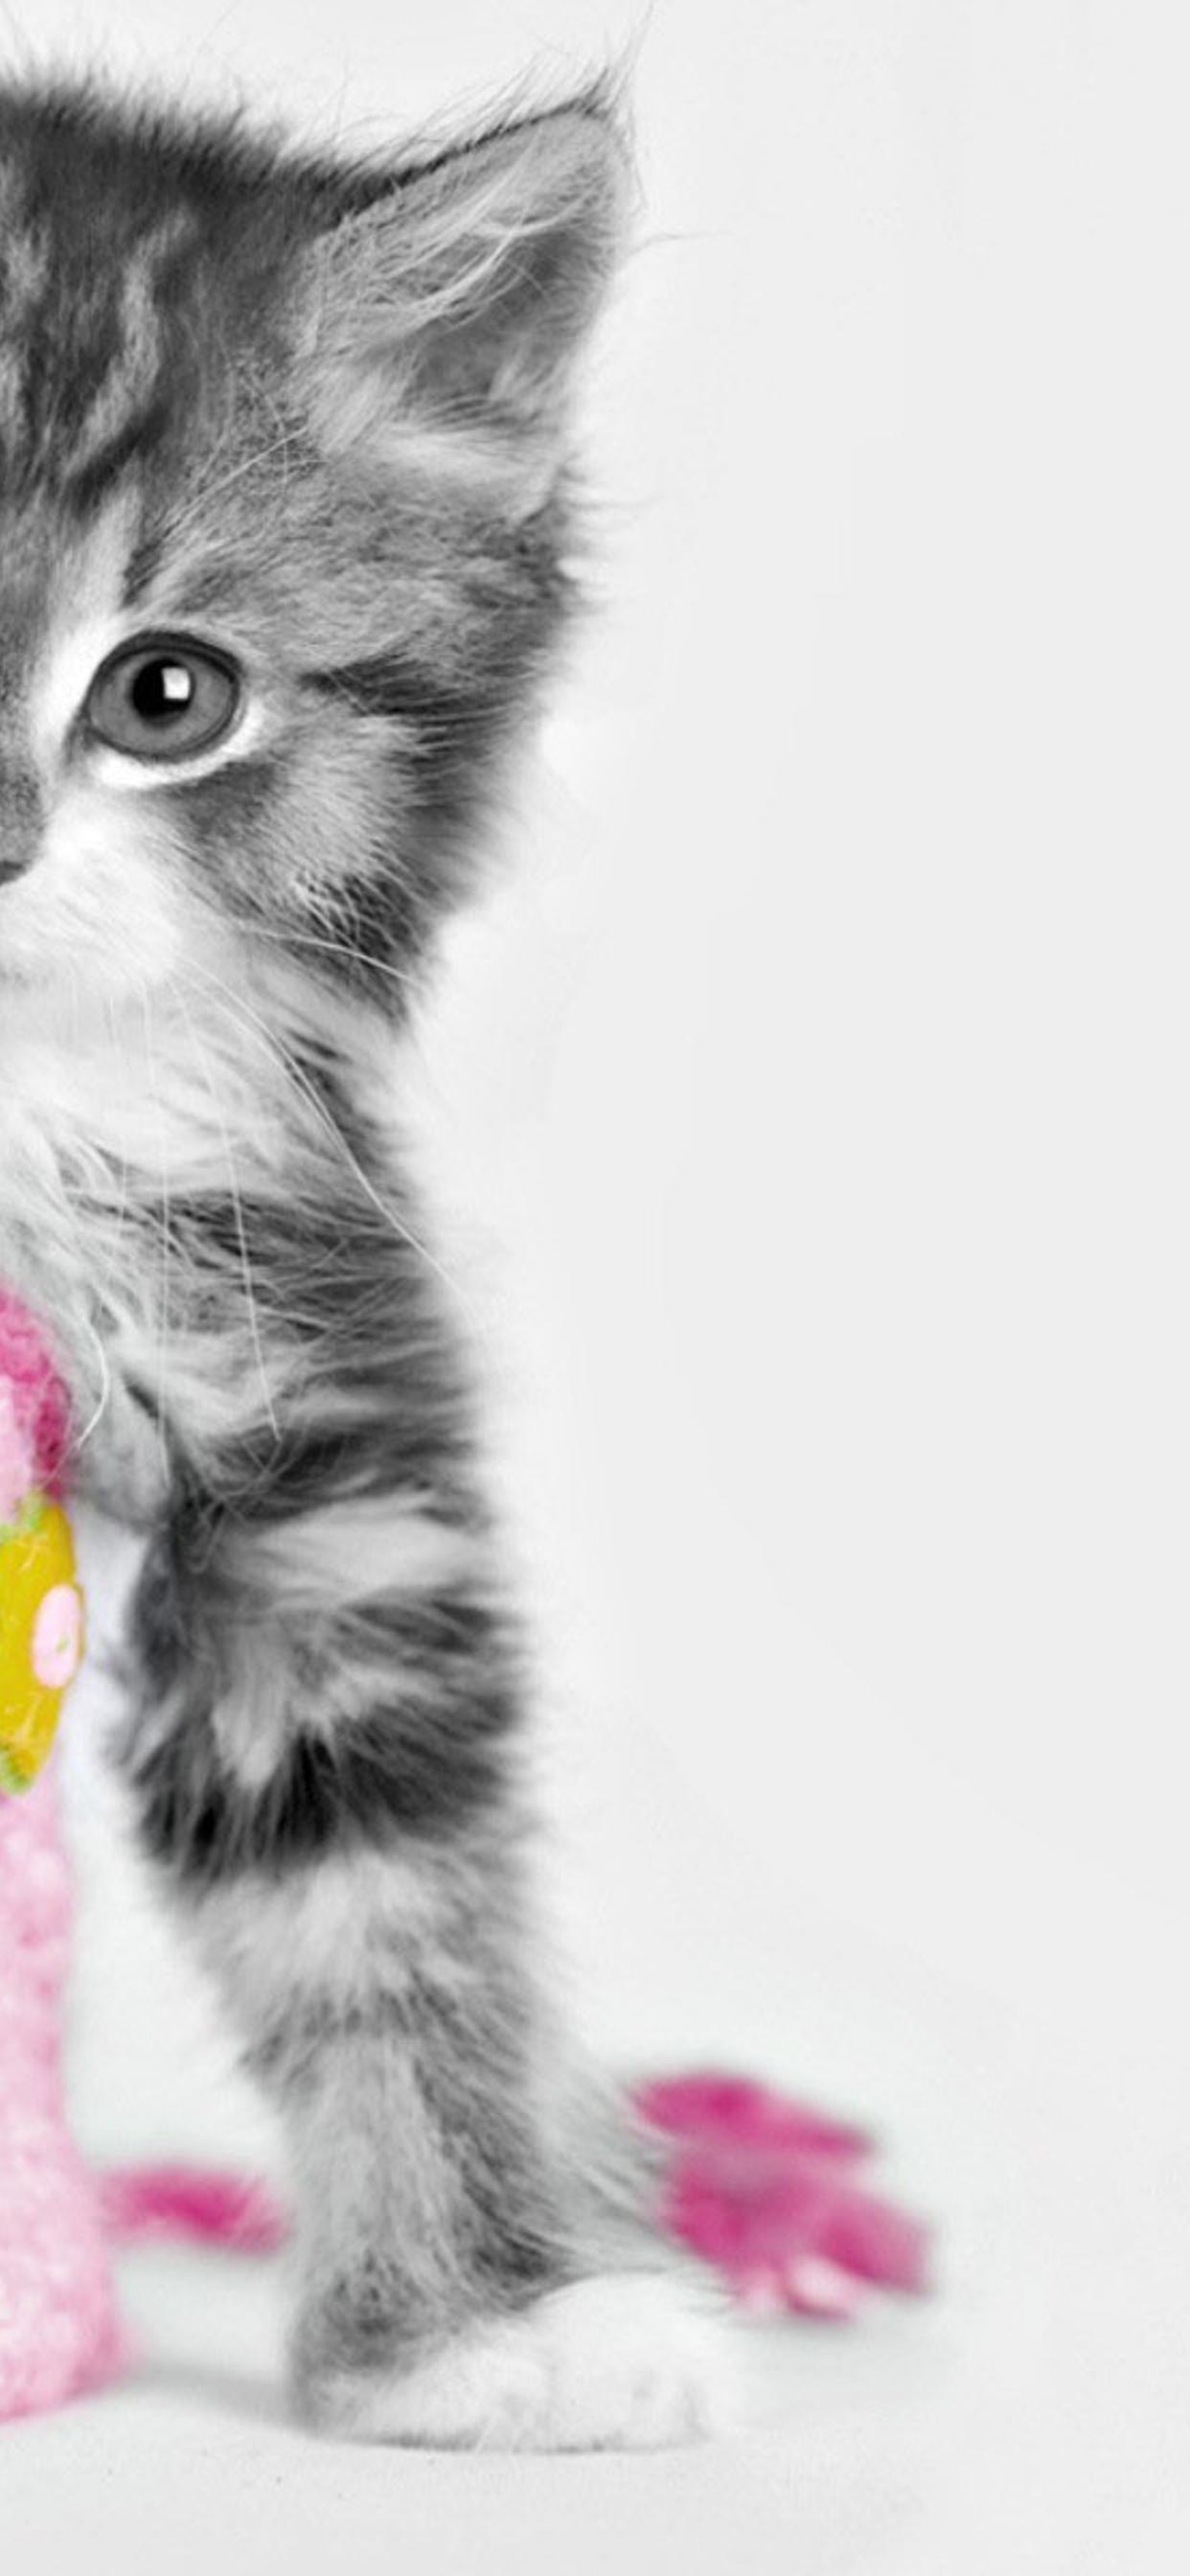 Sweet Little Cat And A Pink Bag Hd Wallpaper